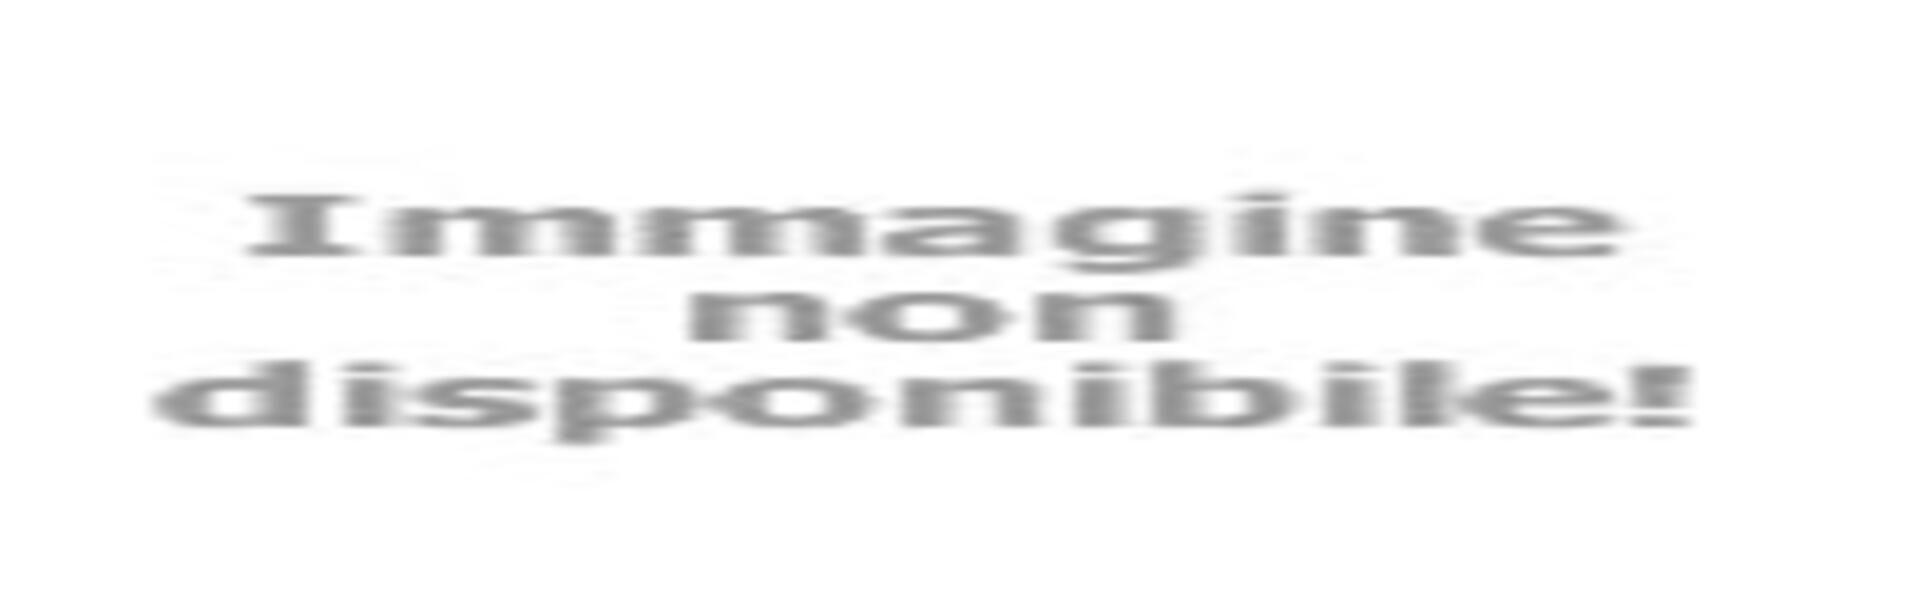 upgarda it hotel-olivo-arco-trento 005